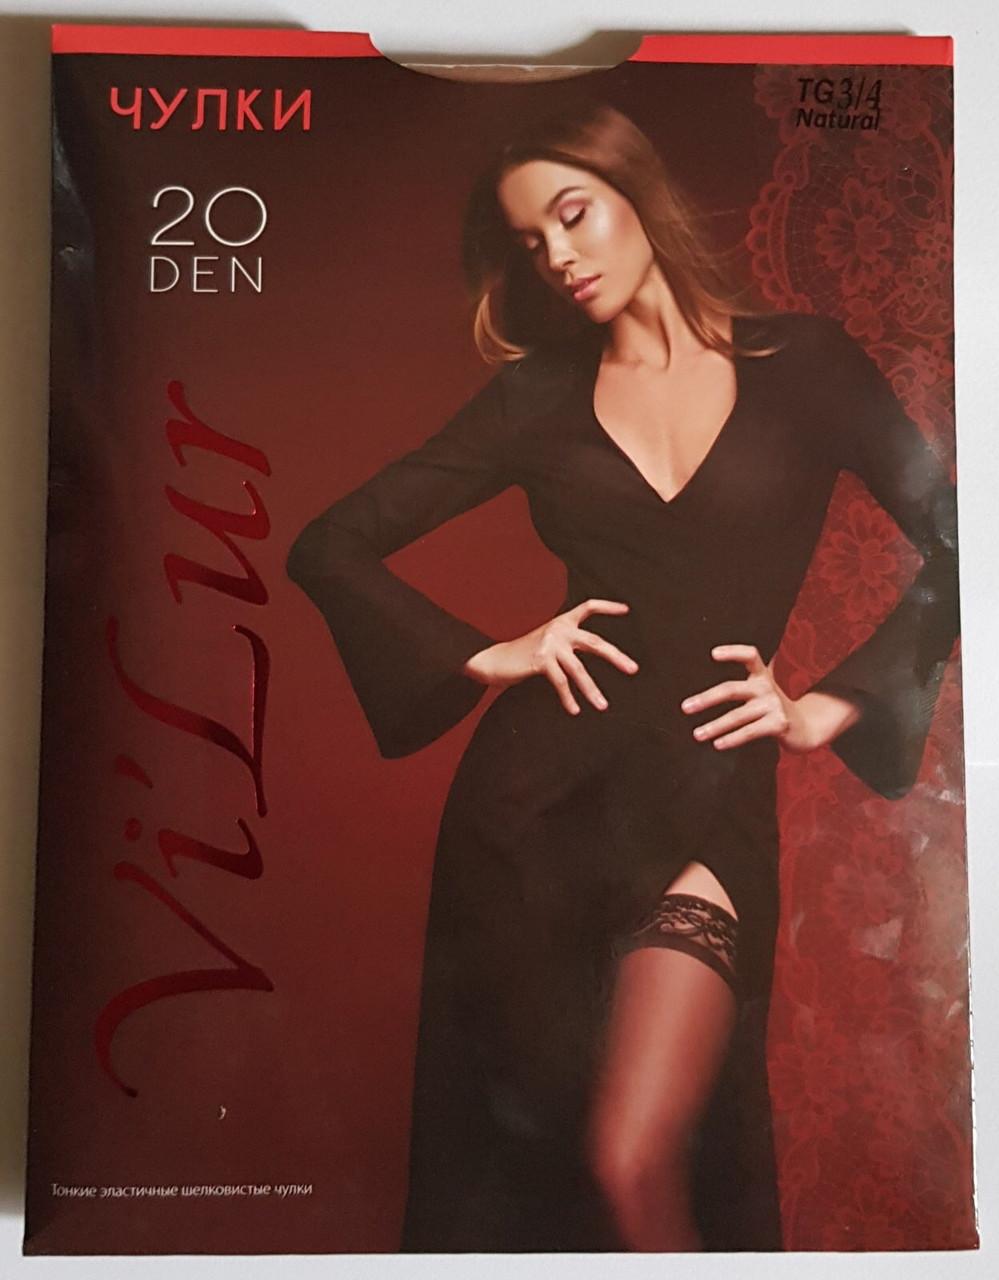 Чулки женские Vi'lur 20d